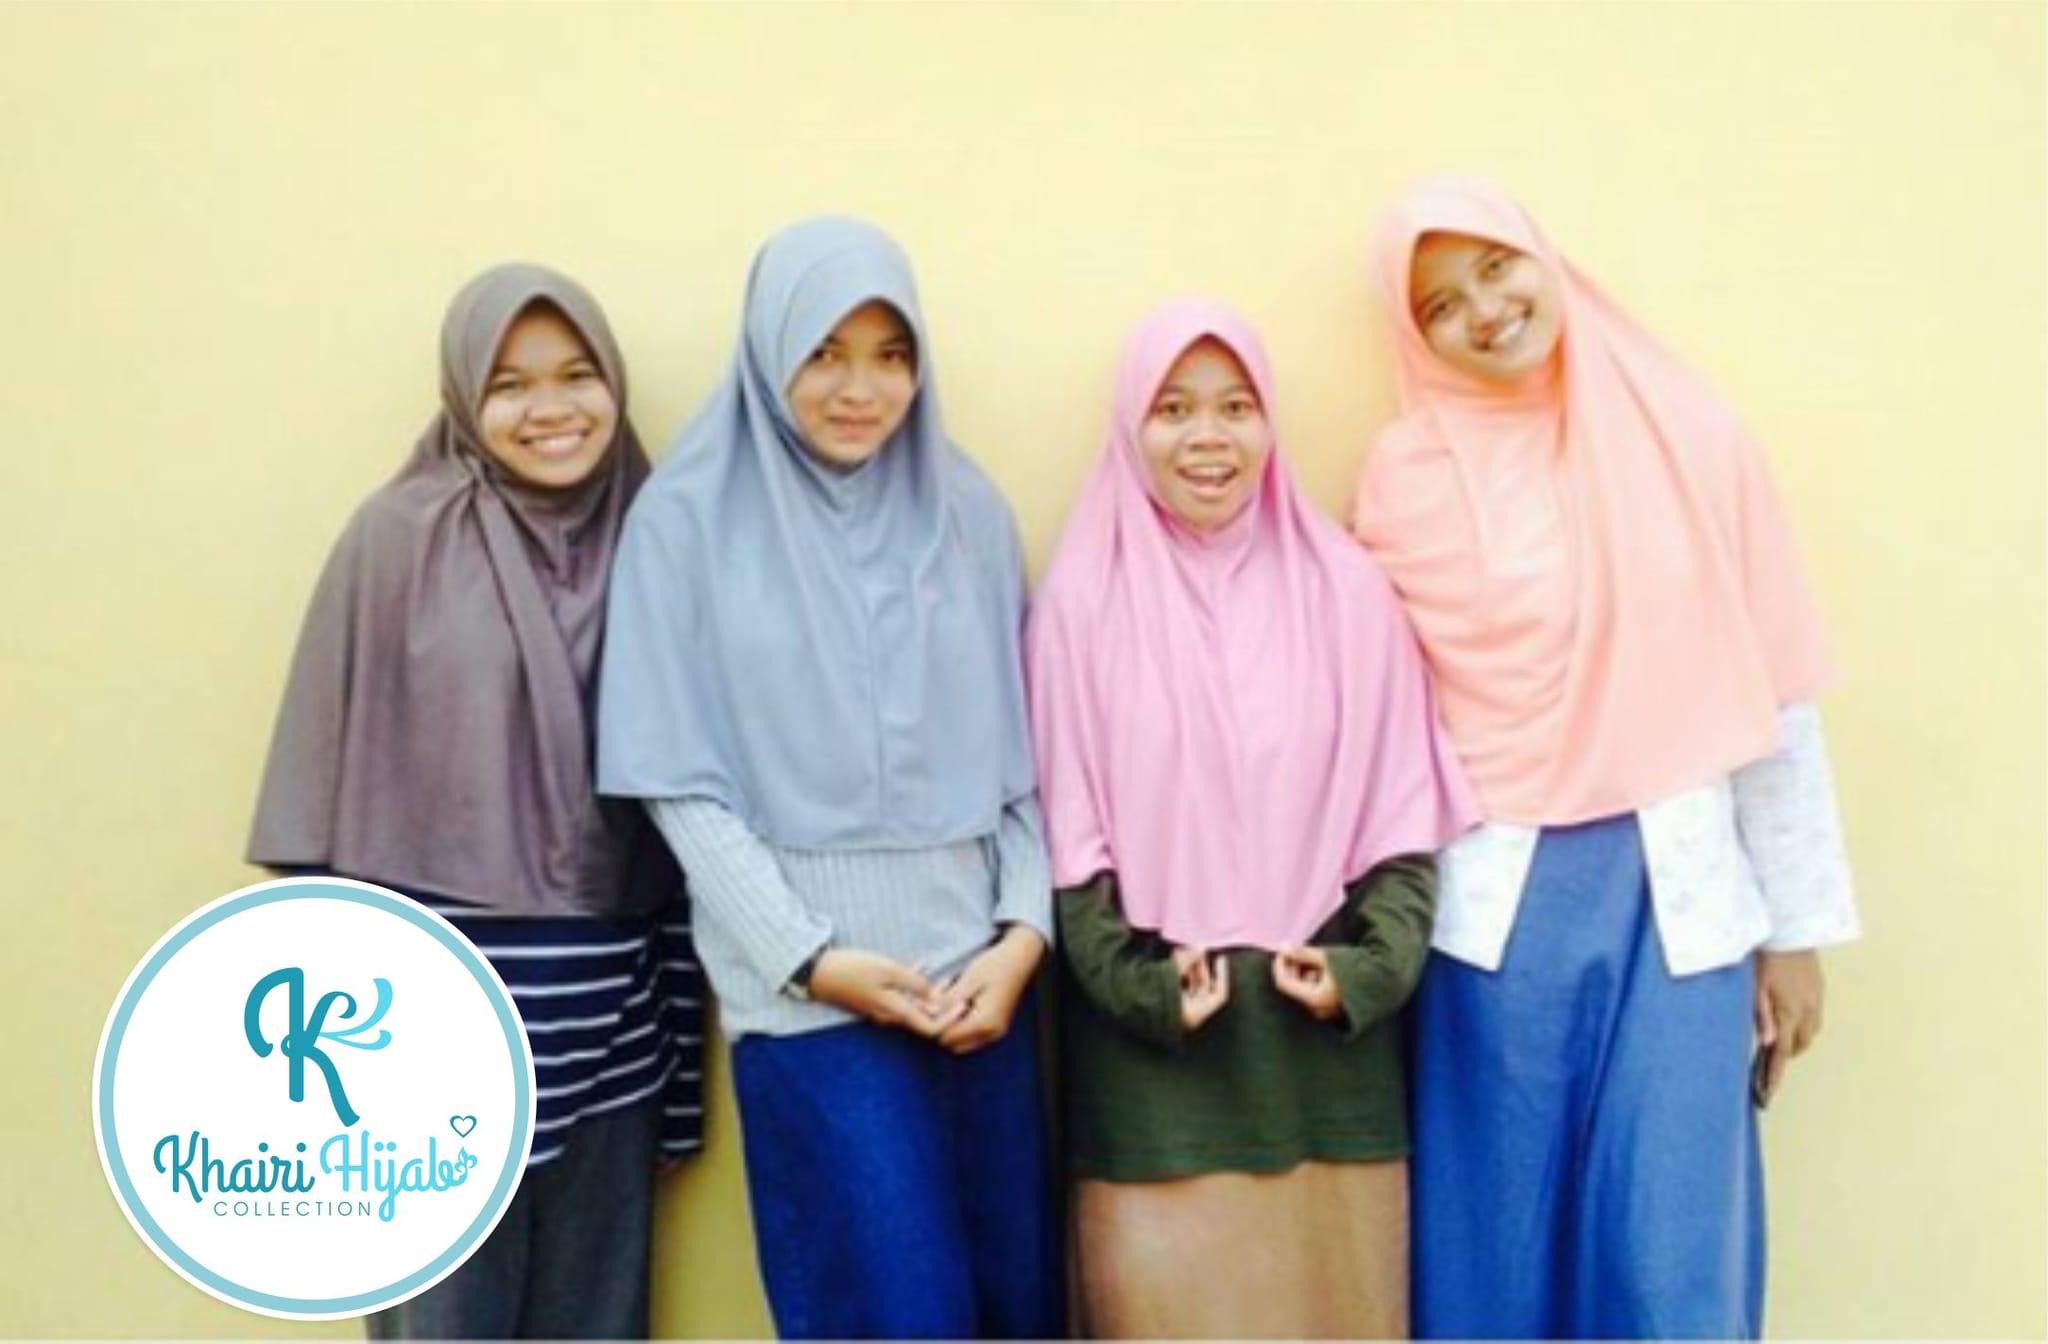 Jual Jilbab Polos Hijab Kaos Jilbab adem Jilbab Sekolah Size L Khairi Hijab